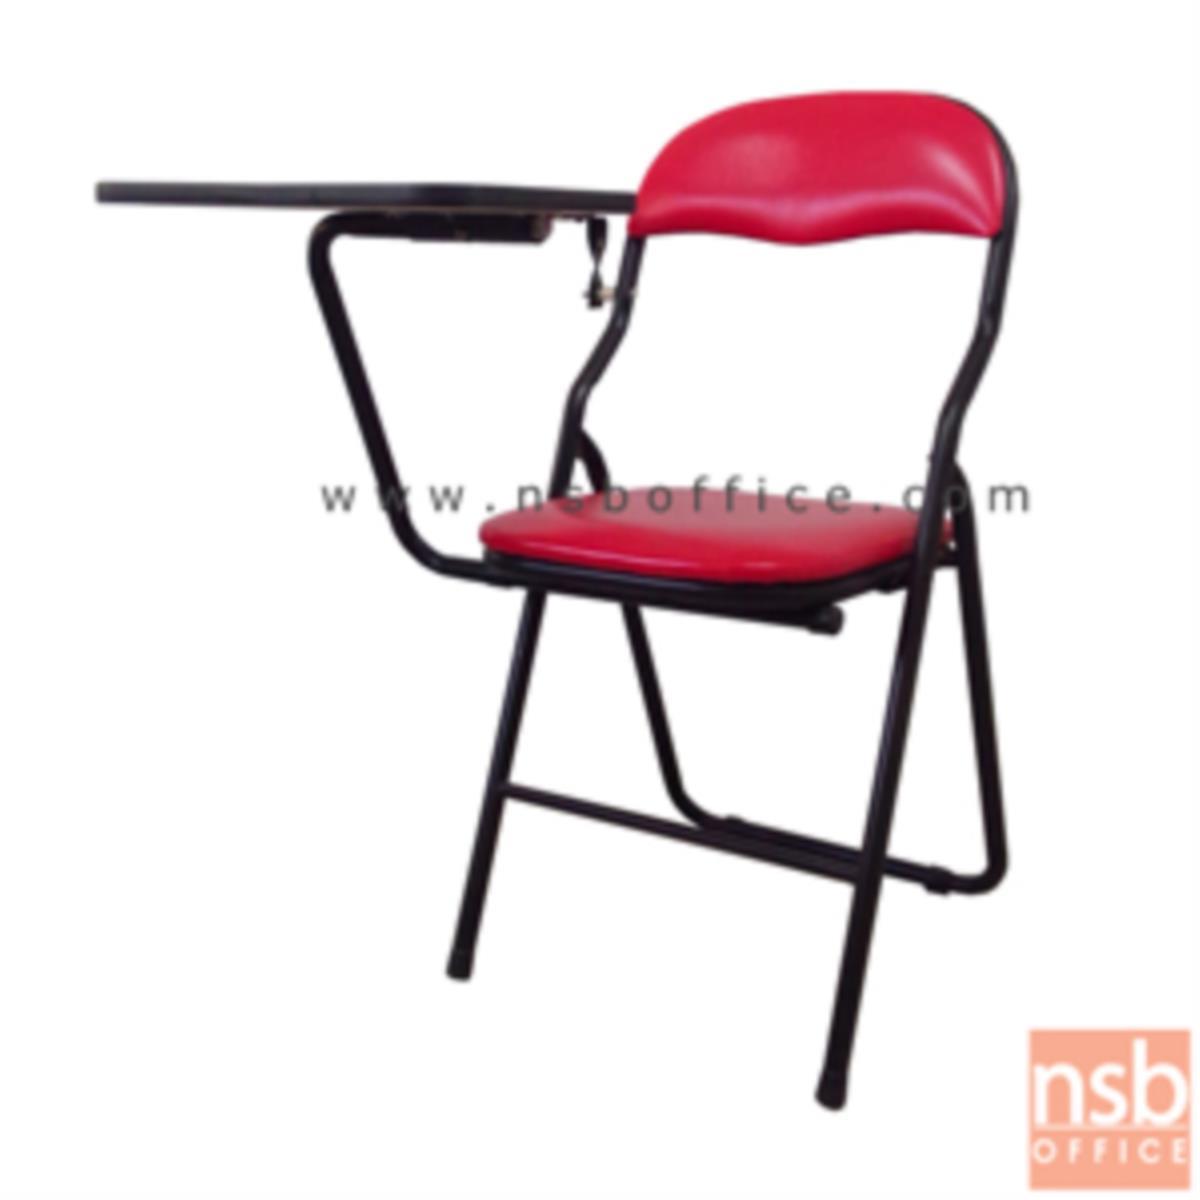 B07A021:เก้าอี้เลคเชอร์หุ้มหนังเทียม (PVC)  ขาเหล็กพ่นดำ